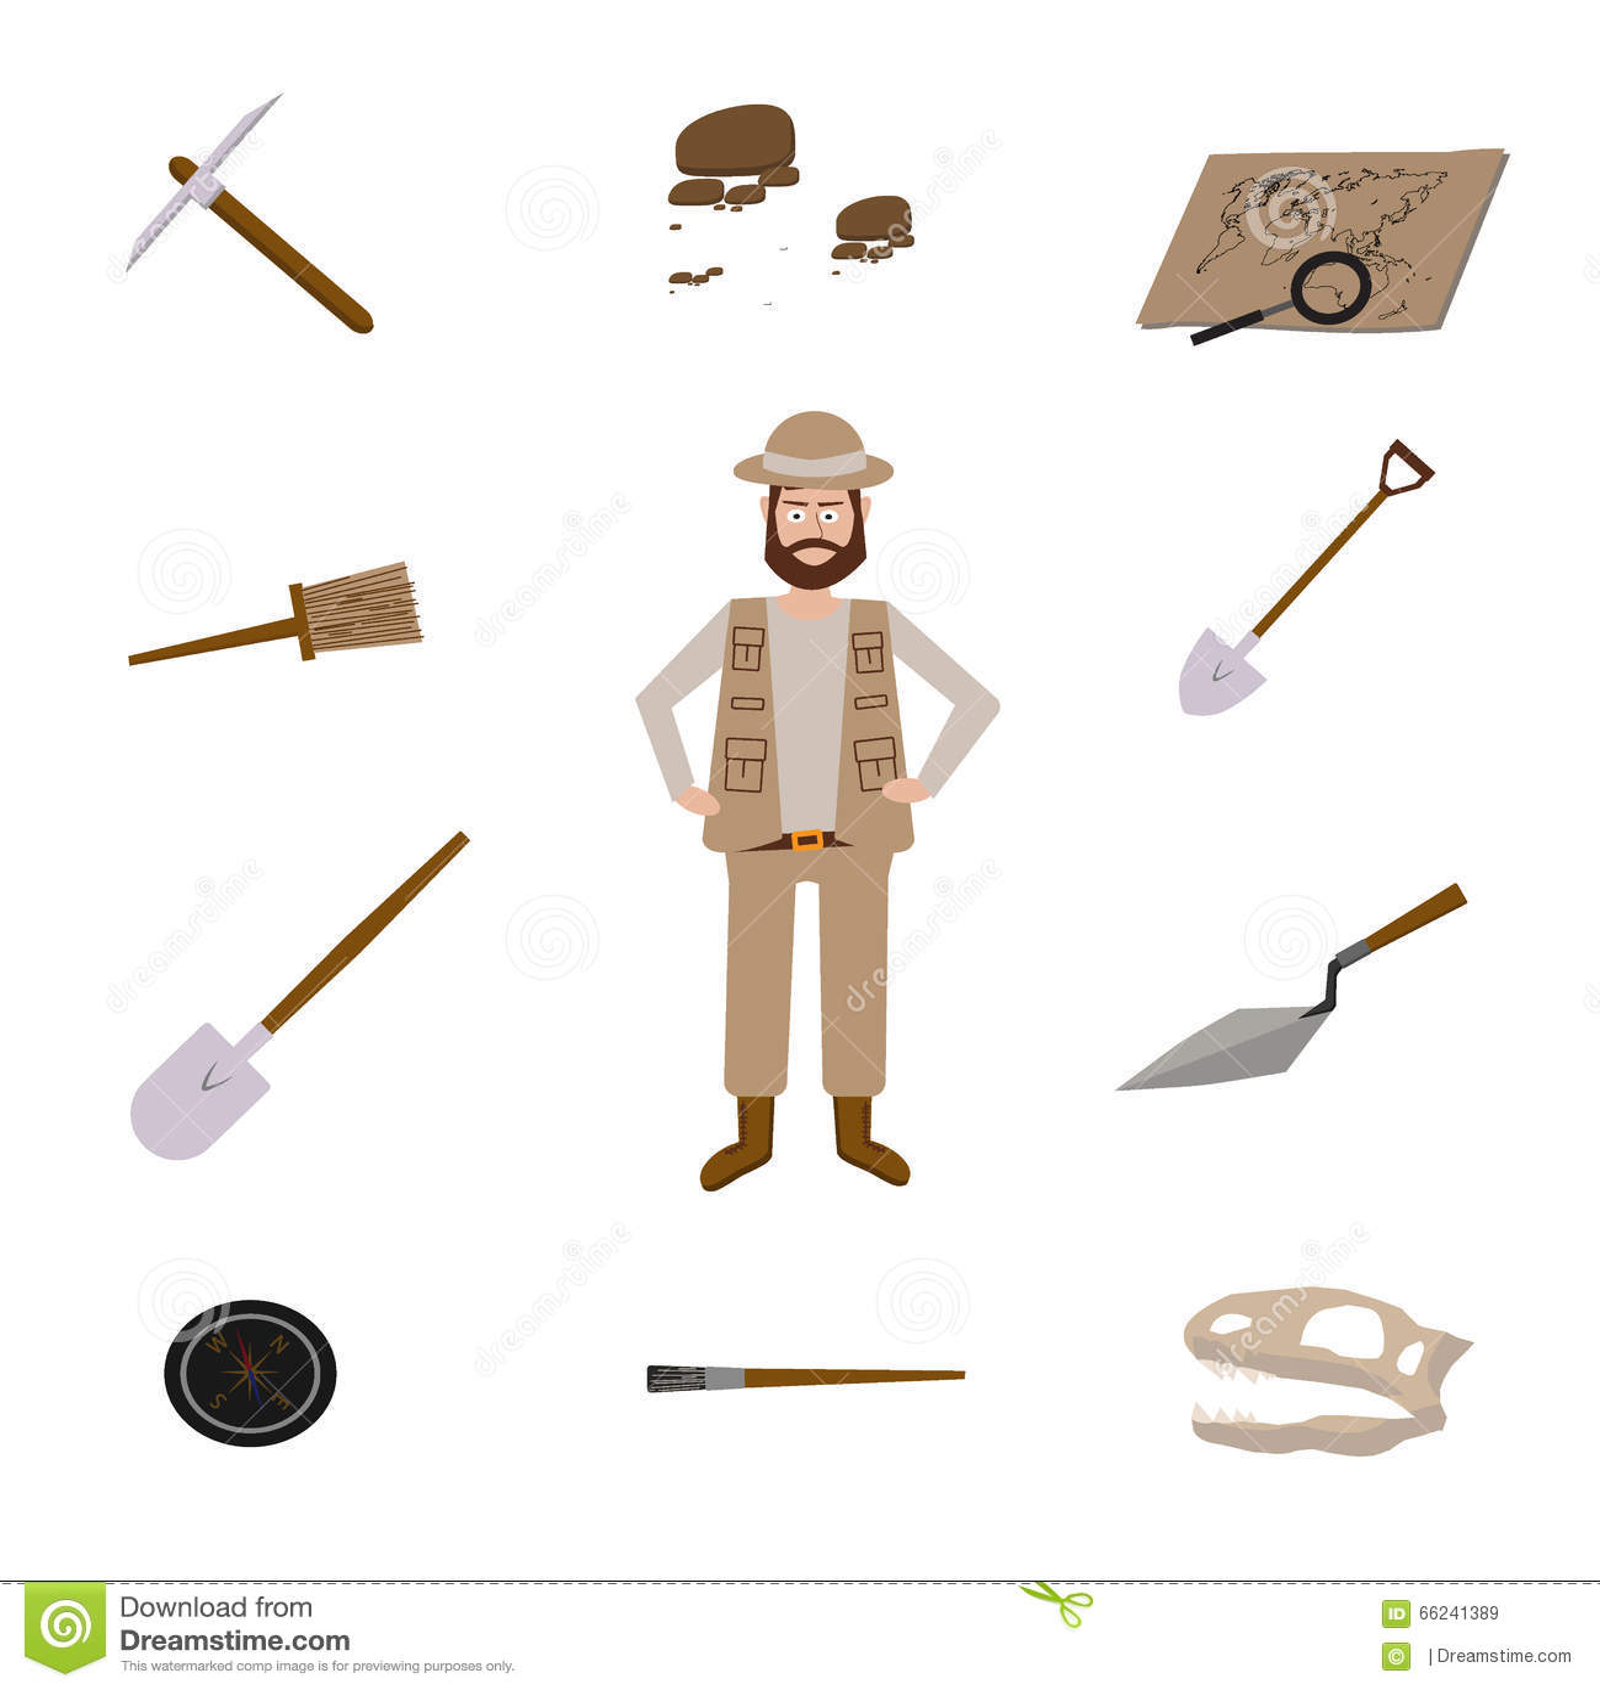 Предметы которые нужны археологу картинки, мальчику